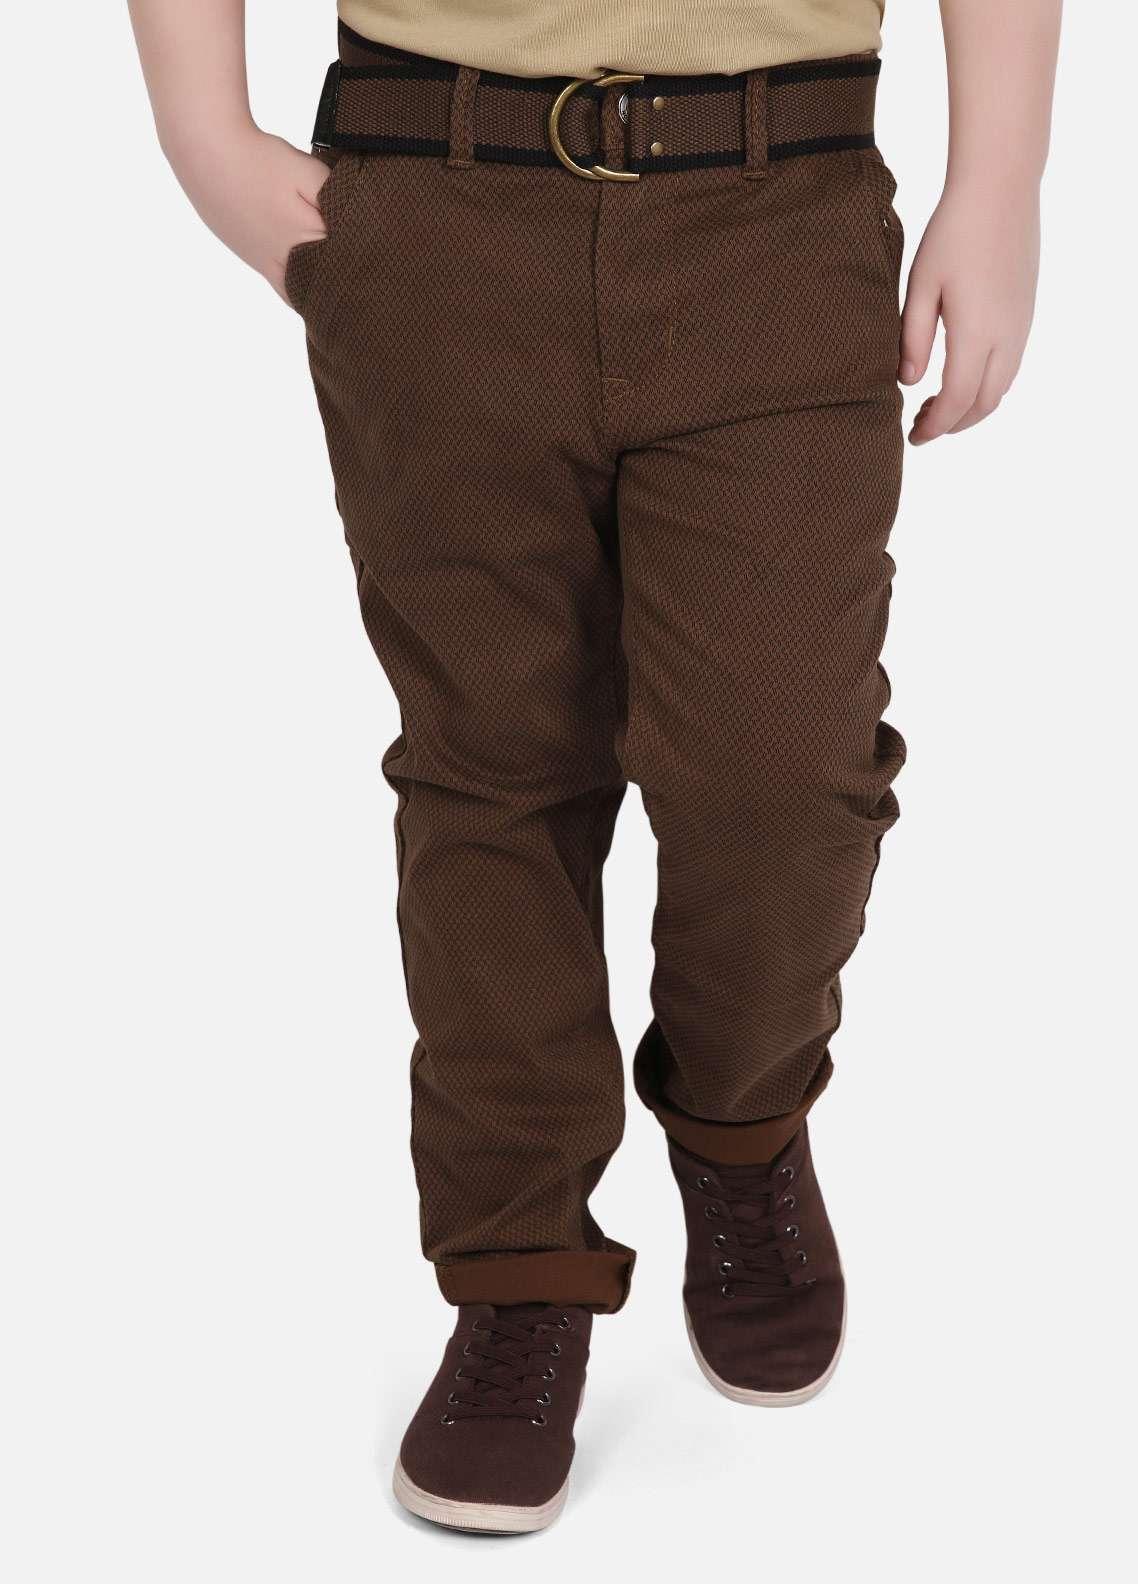 Edenrobe Jeans Plain Texture Boys Pants - Brown EDK18P 5715